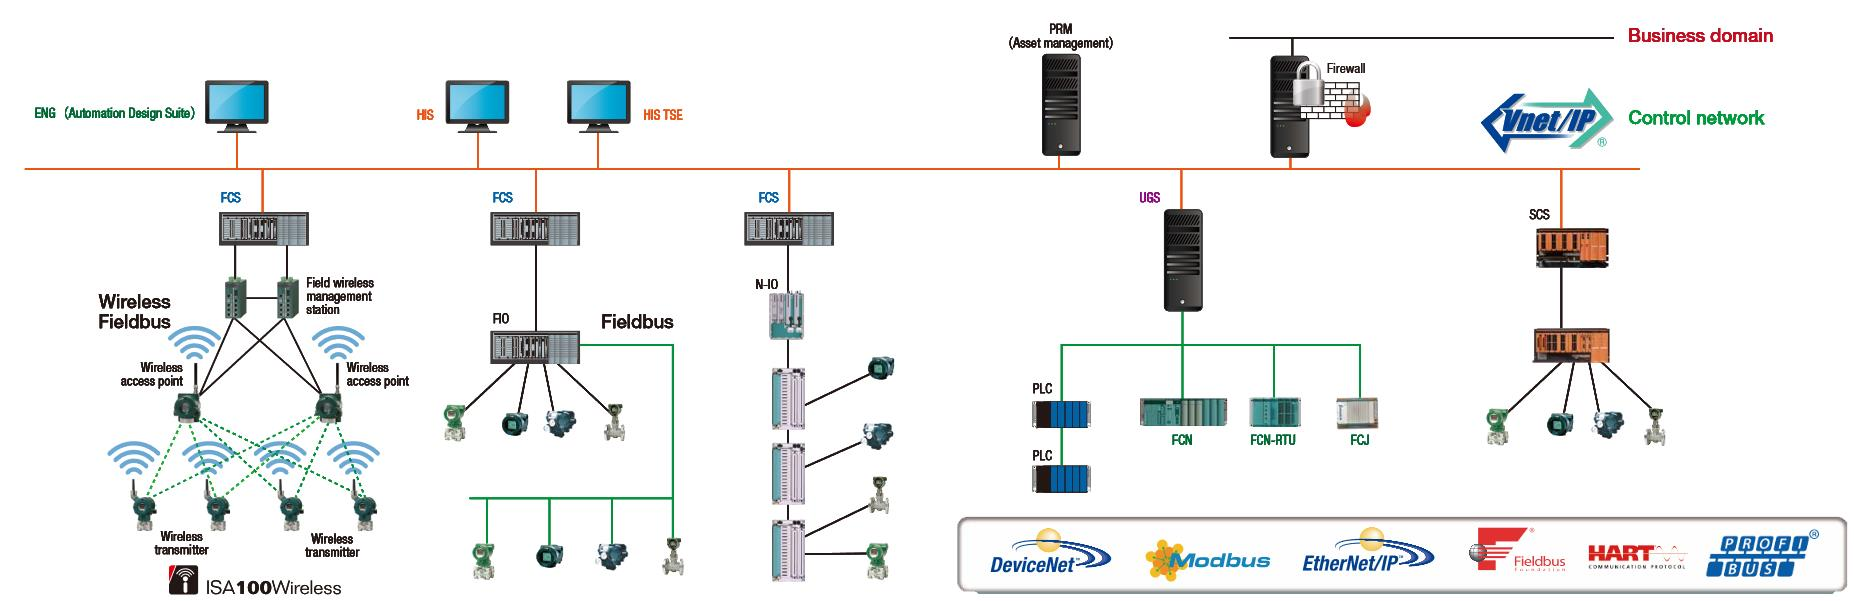 Migraci n de sistemas distribuidos rm automatizacion for Control m architecture